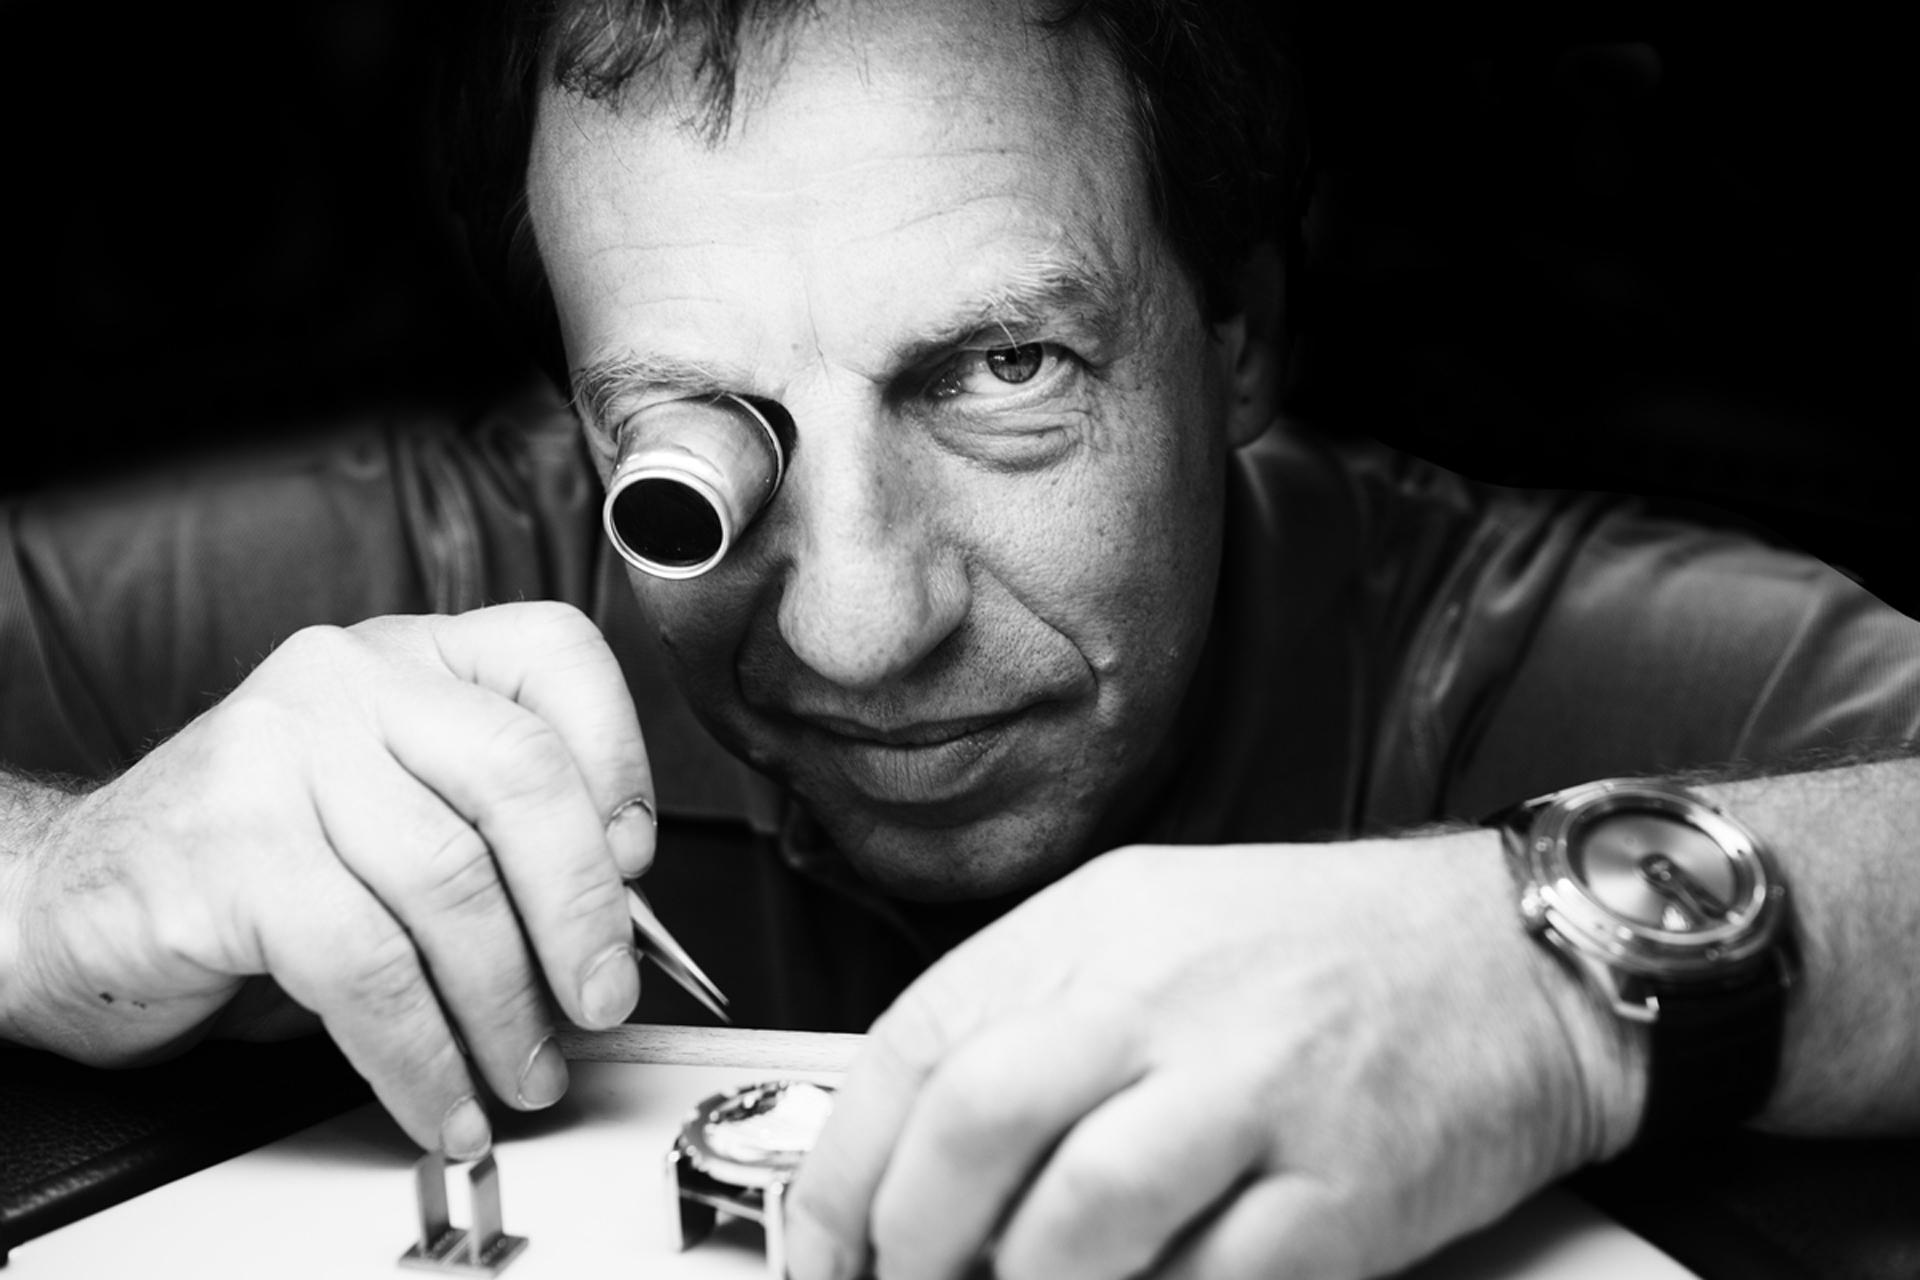 Master Watchmaker and Co-Founder of De Bethune, Denis Flageollet